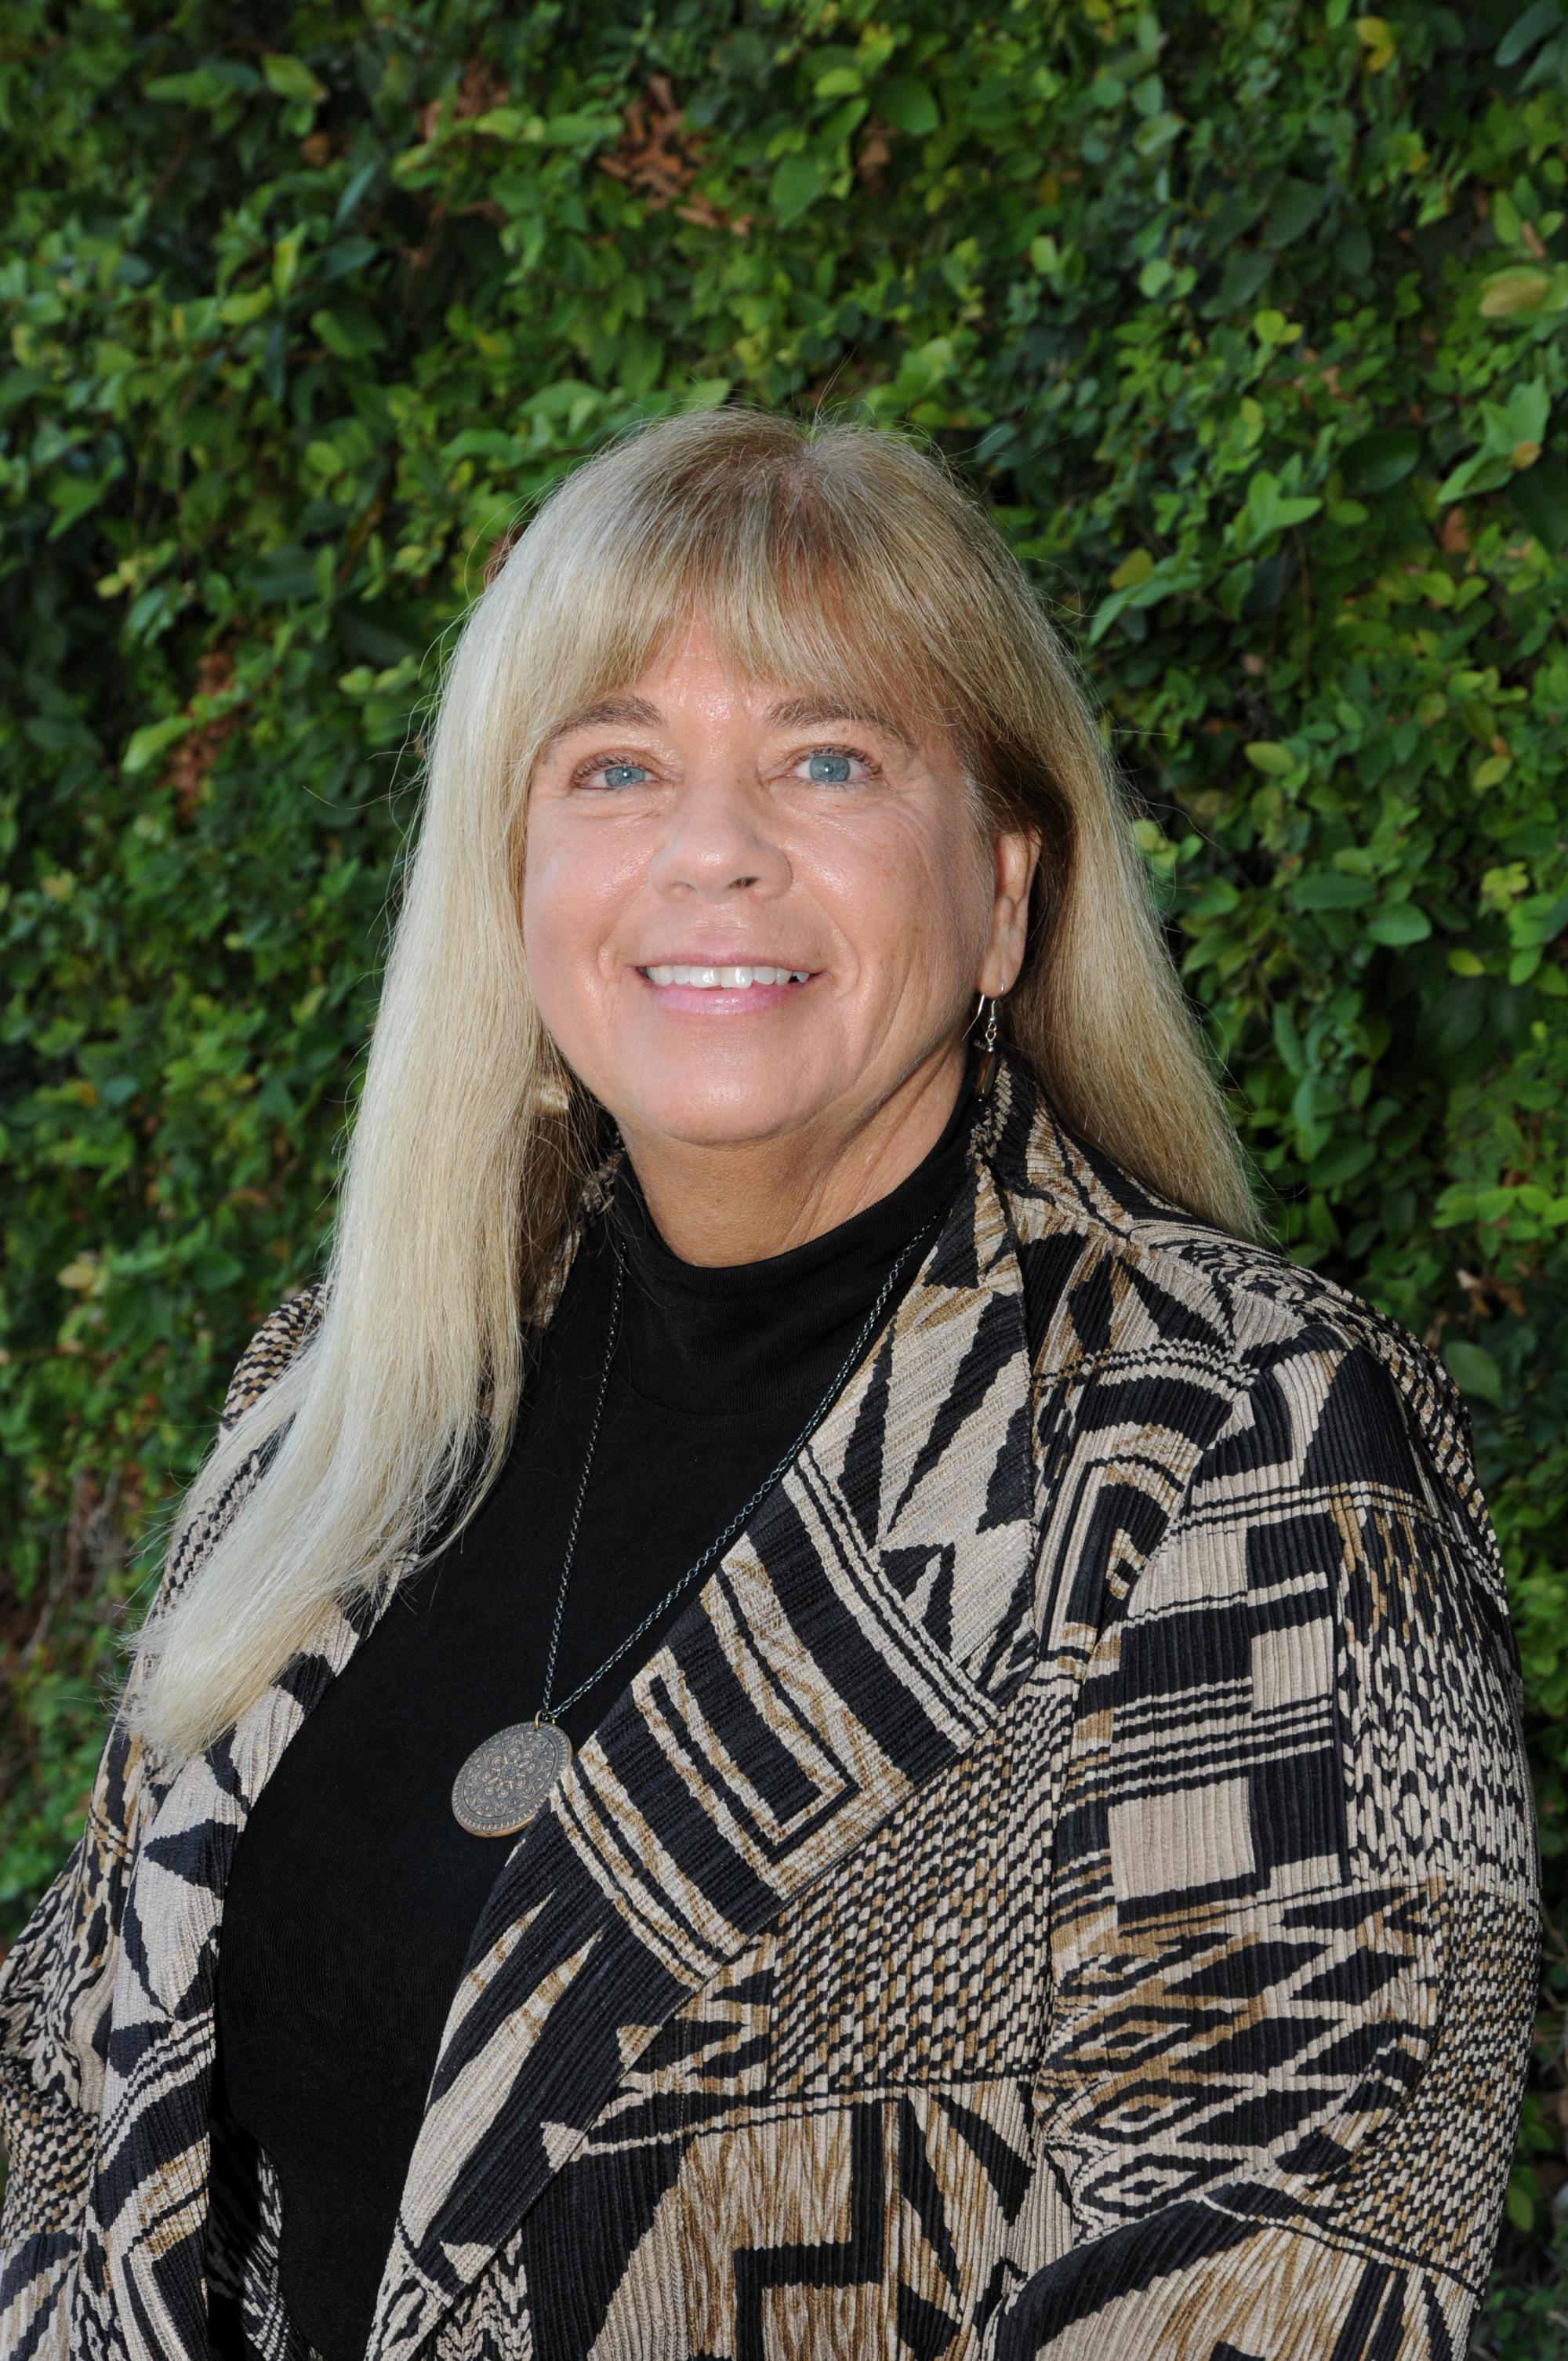 Kathy Short